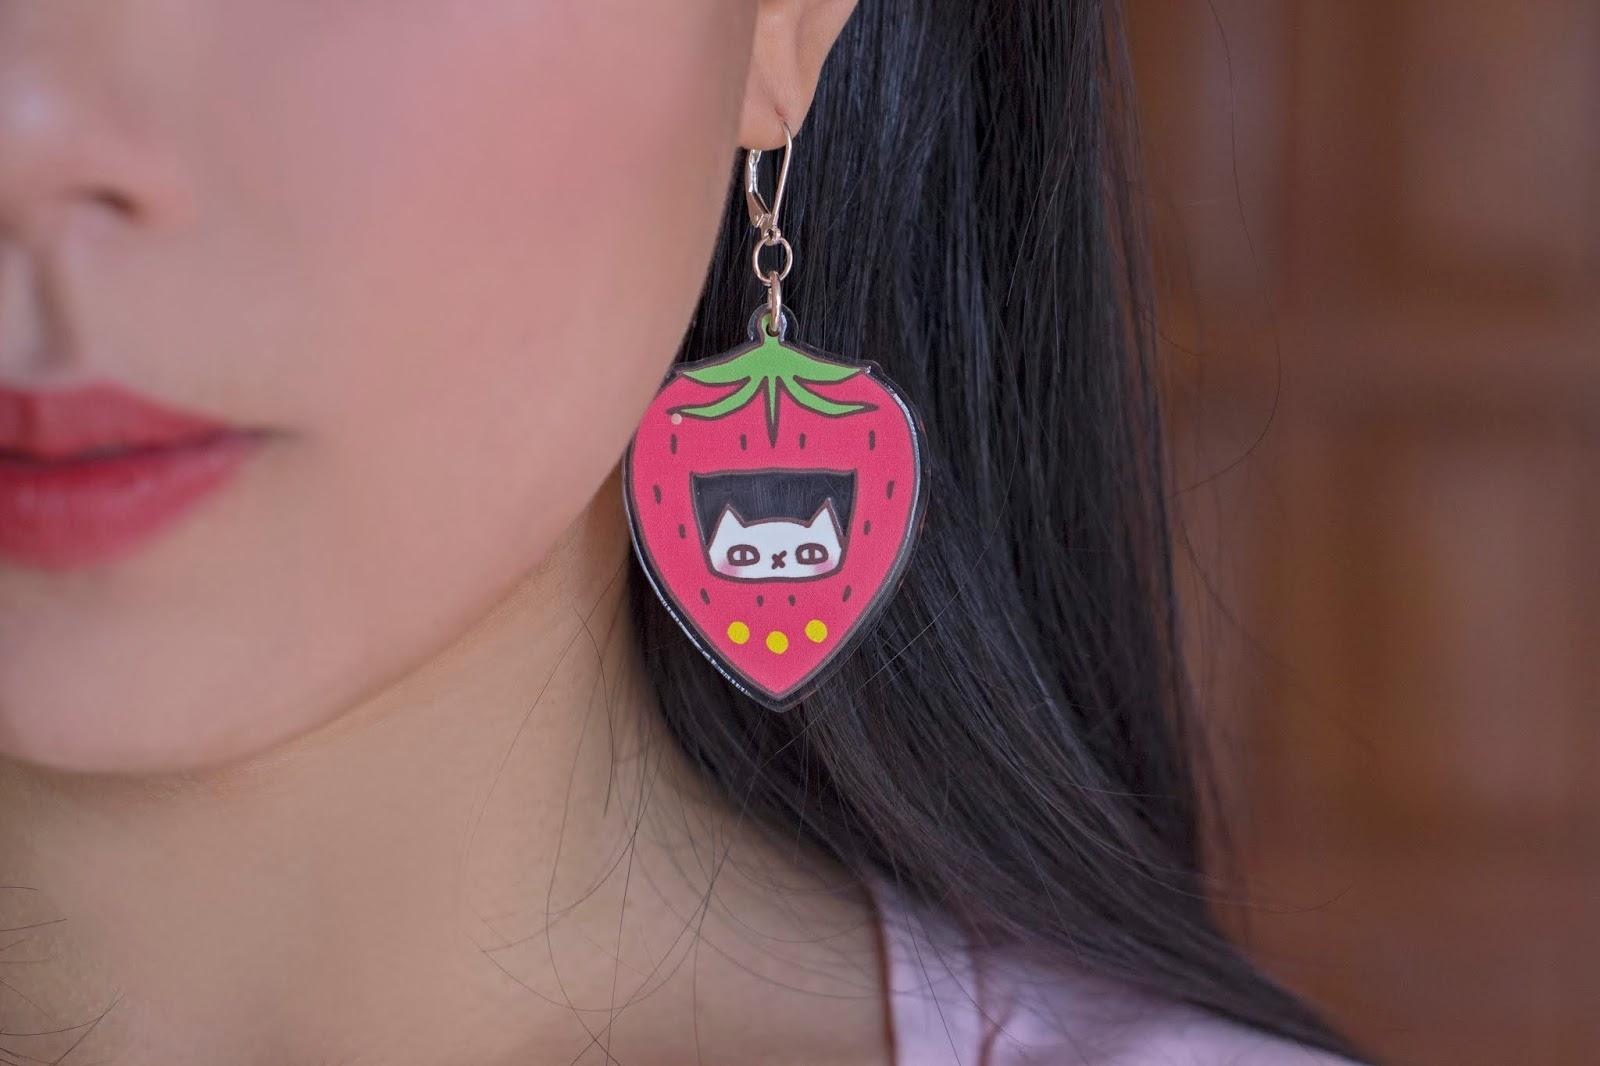 detalle arete acrilico gato tamagochi fresa